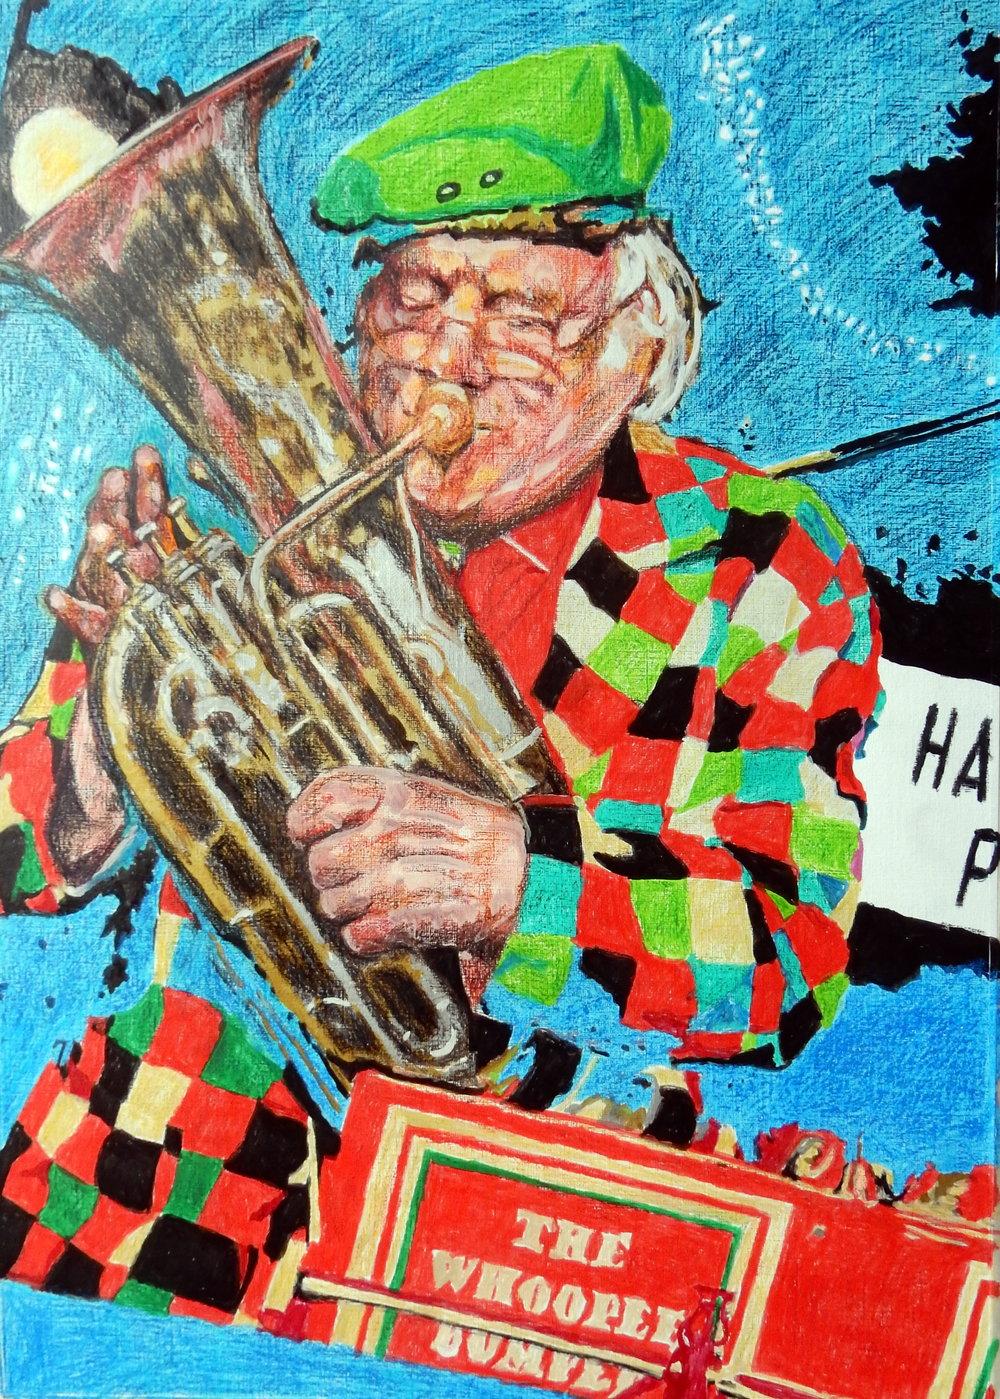 Bob Kerr's Whoopee Band Half Moon Putney